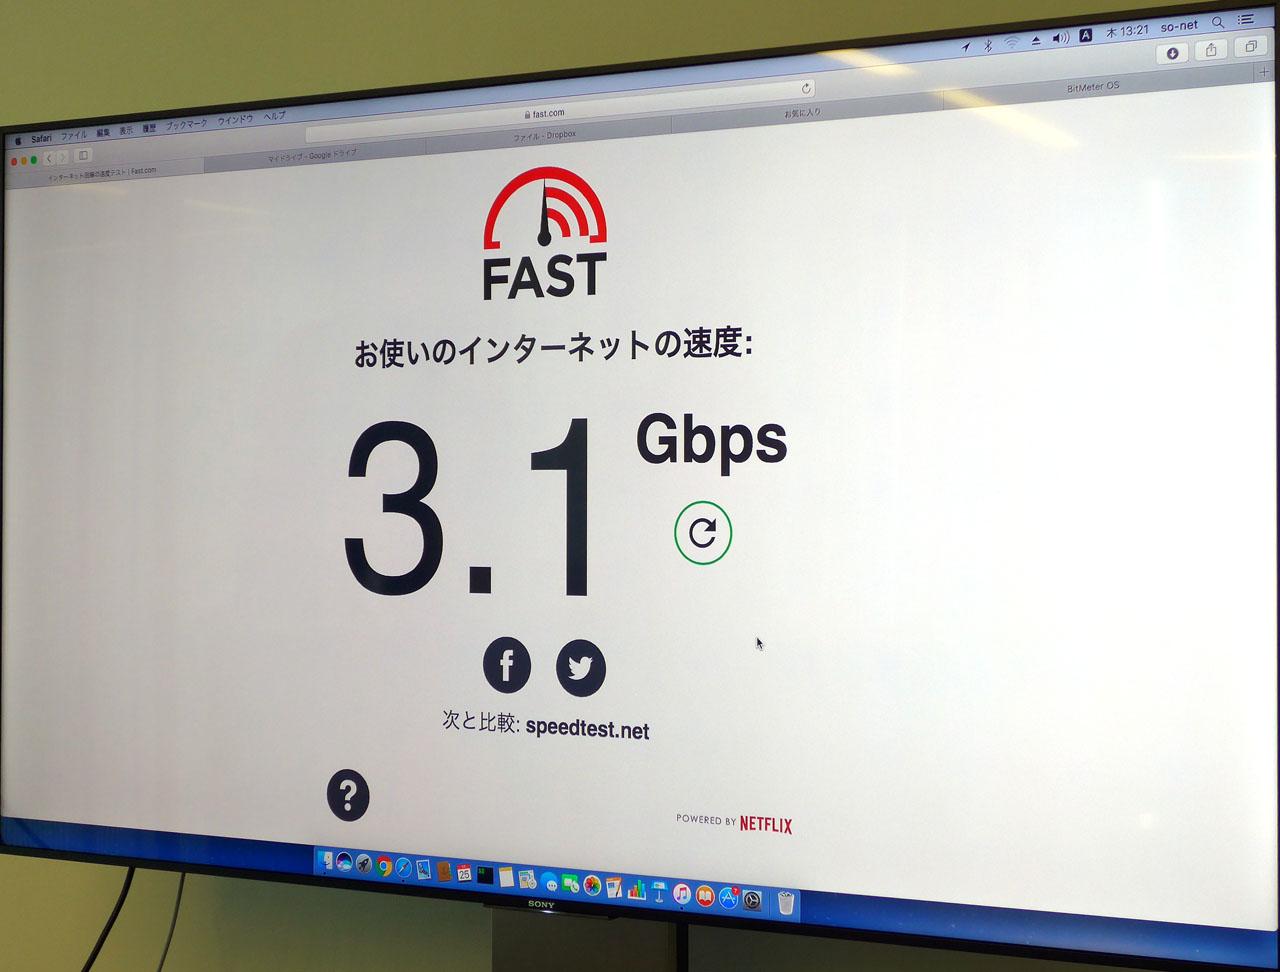 NETFLIX提供のスピードテストでは3.1Gbps